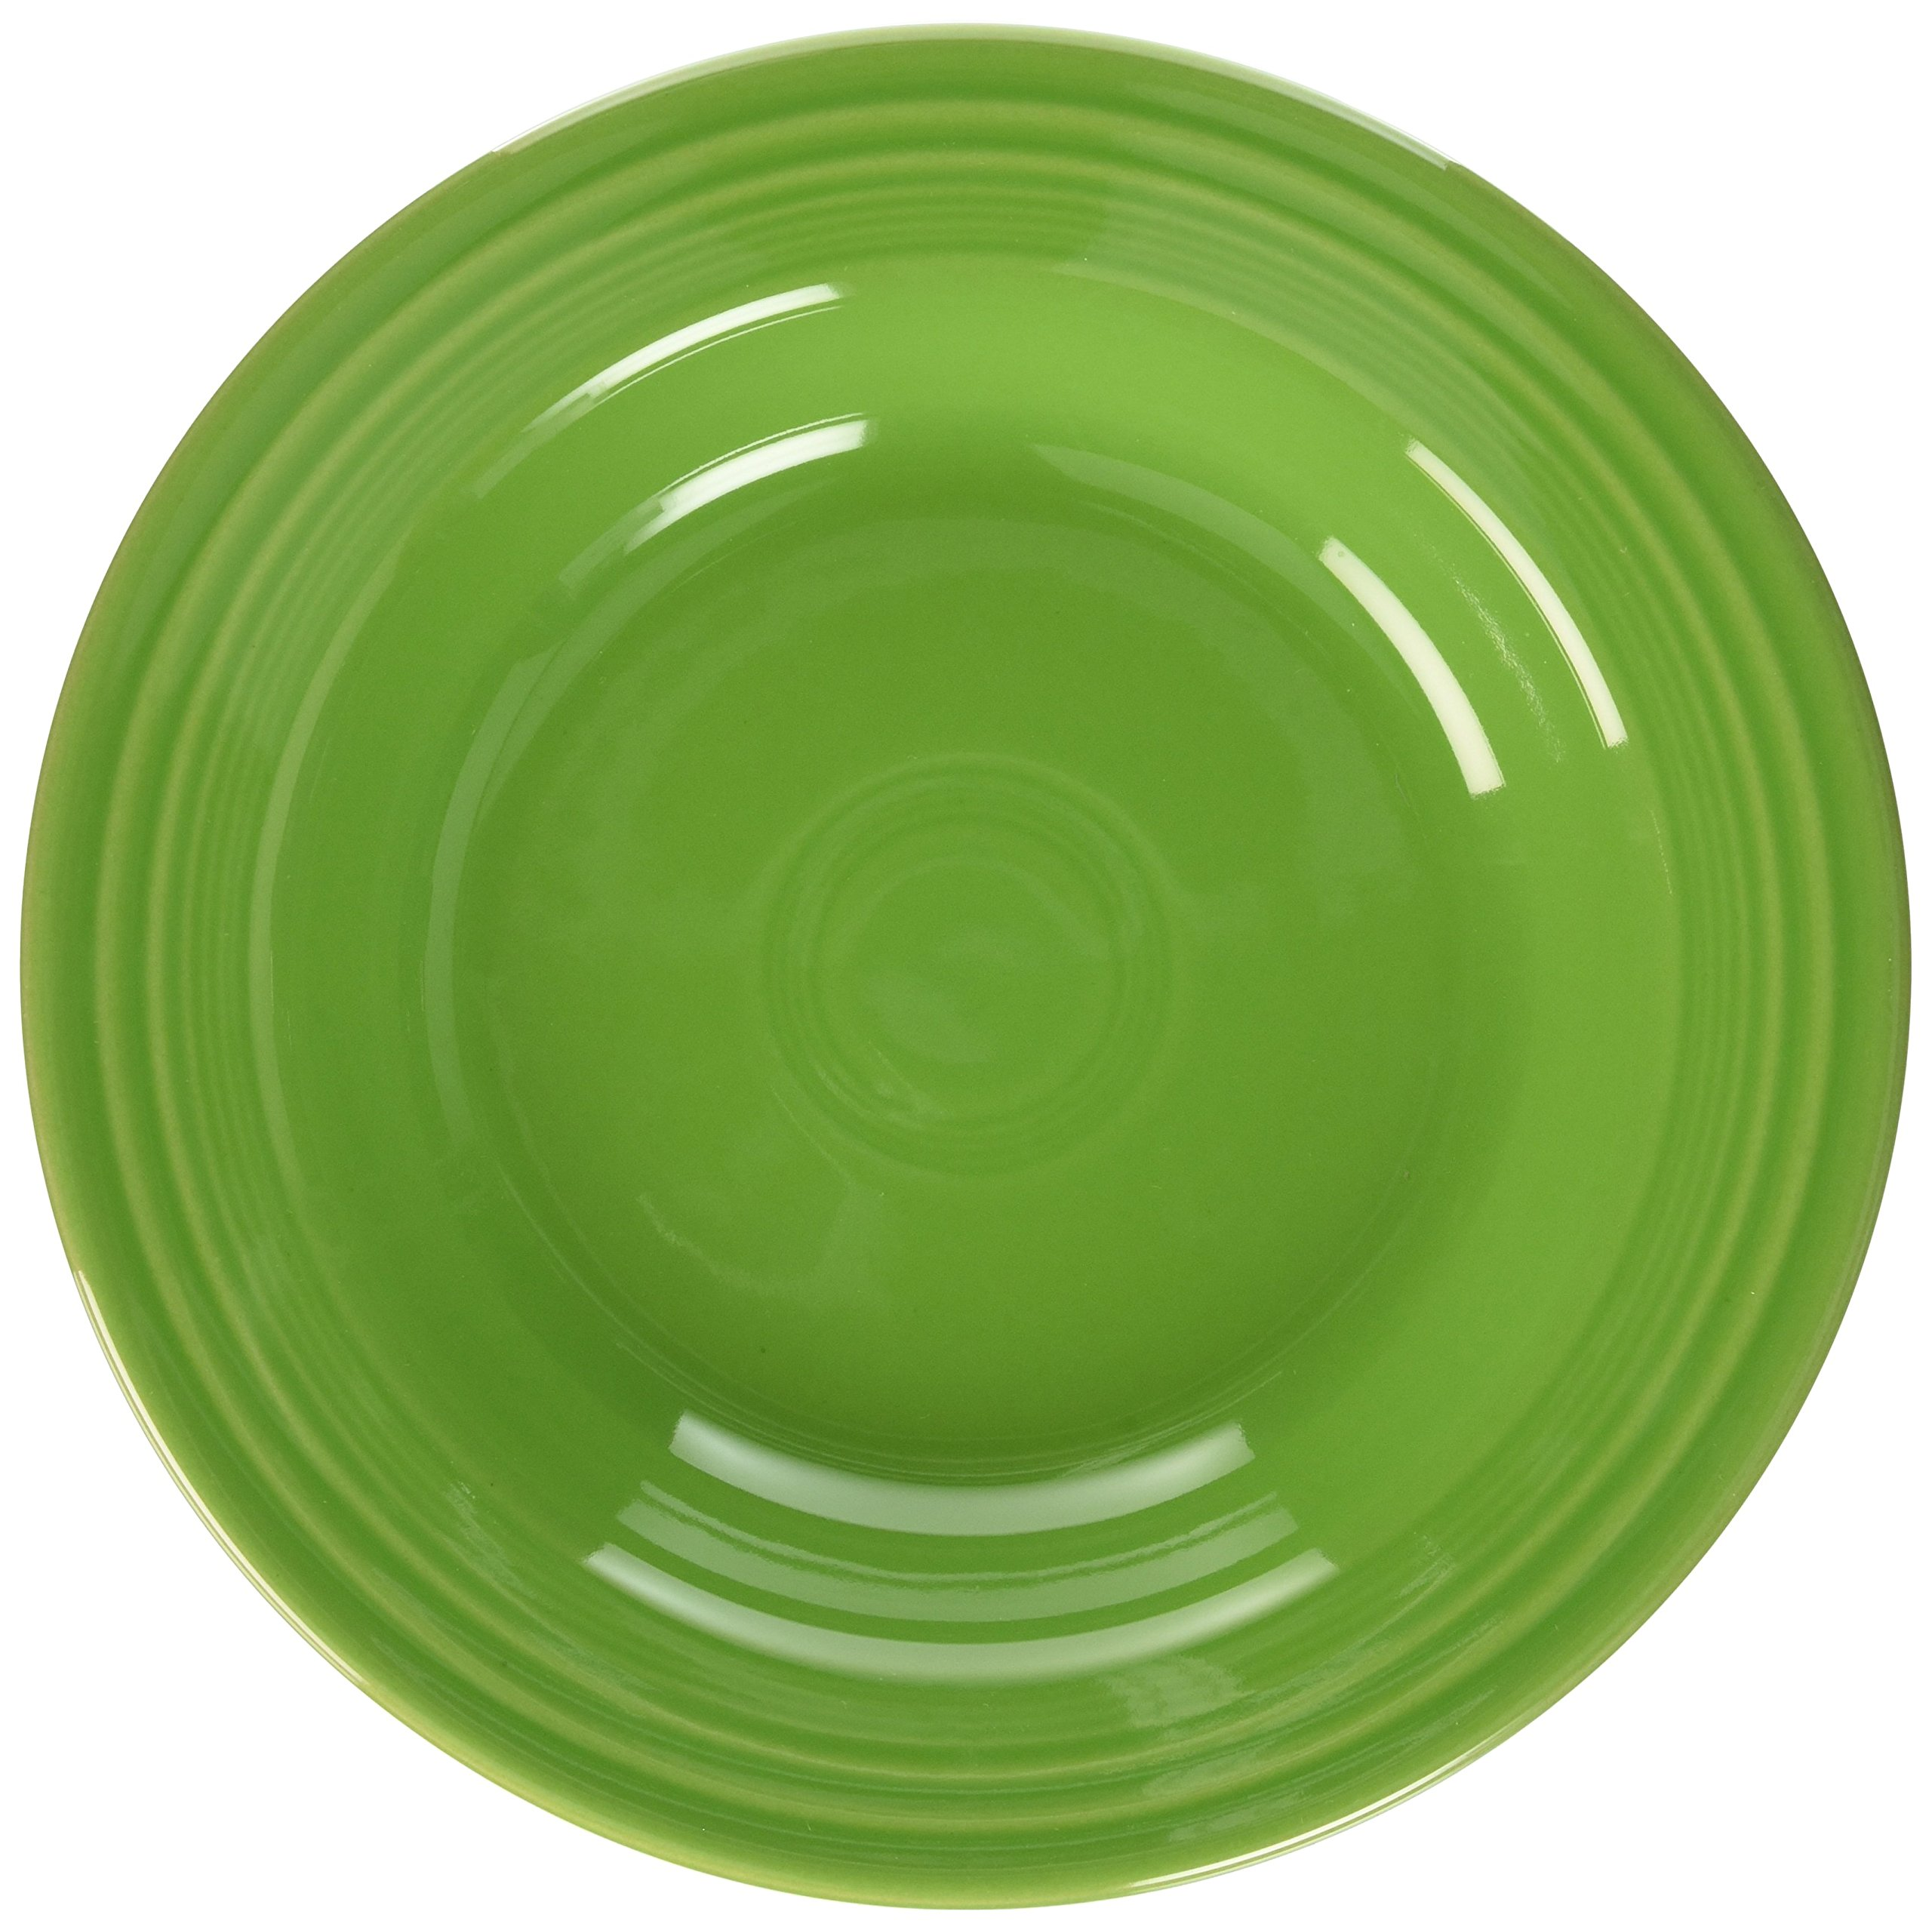 Fiesta 9-Inch, 13-1/4-Ounce Rim Soup Bowl, Shamrock